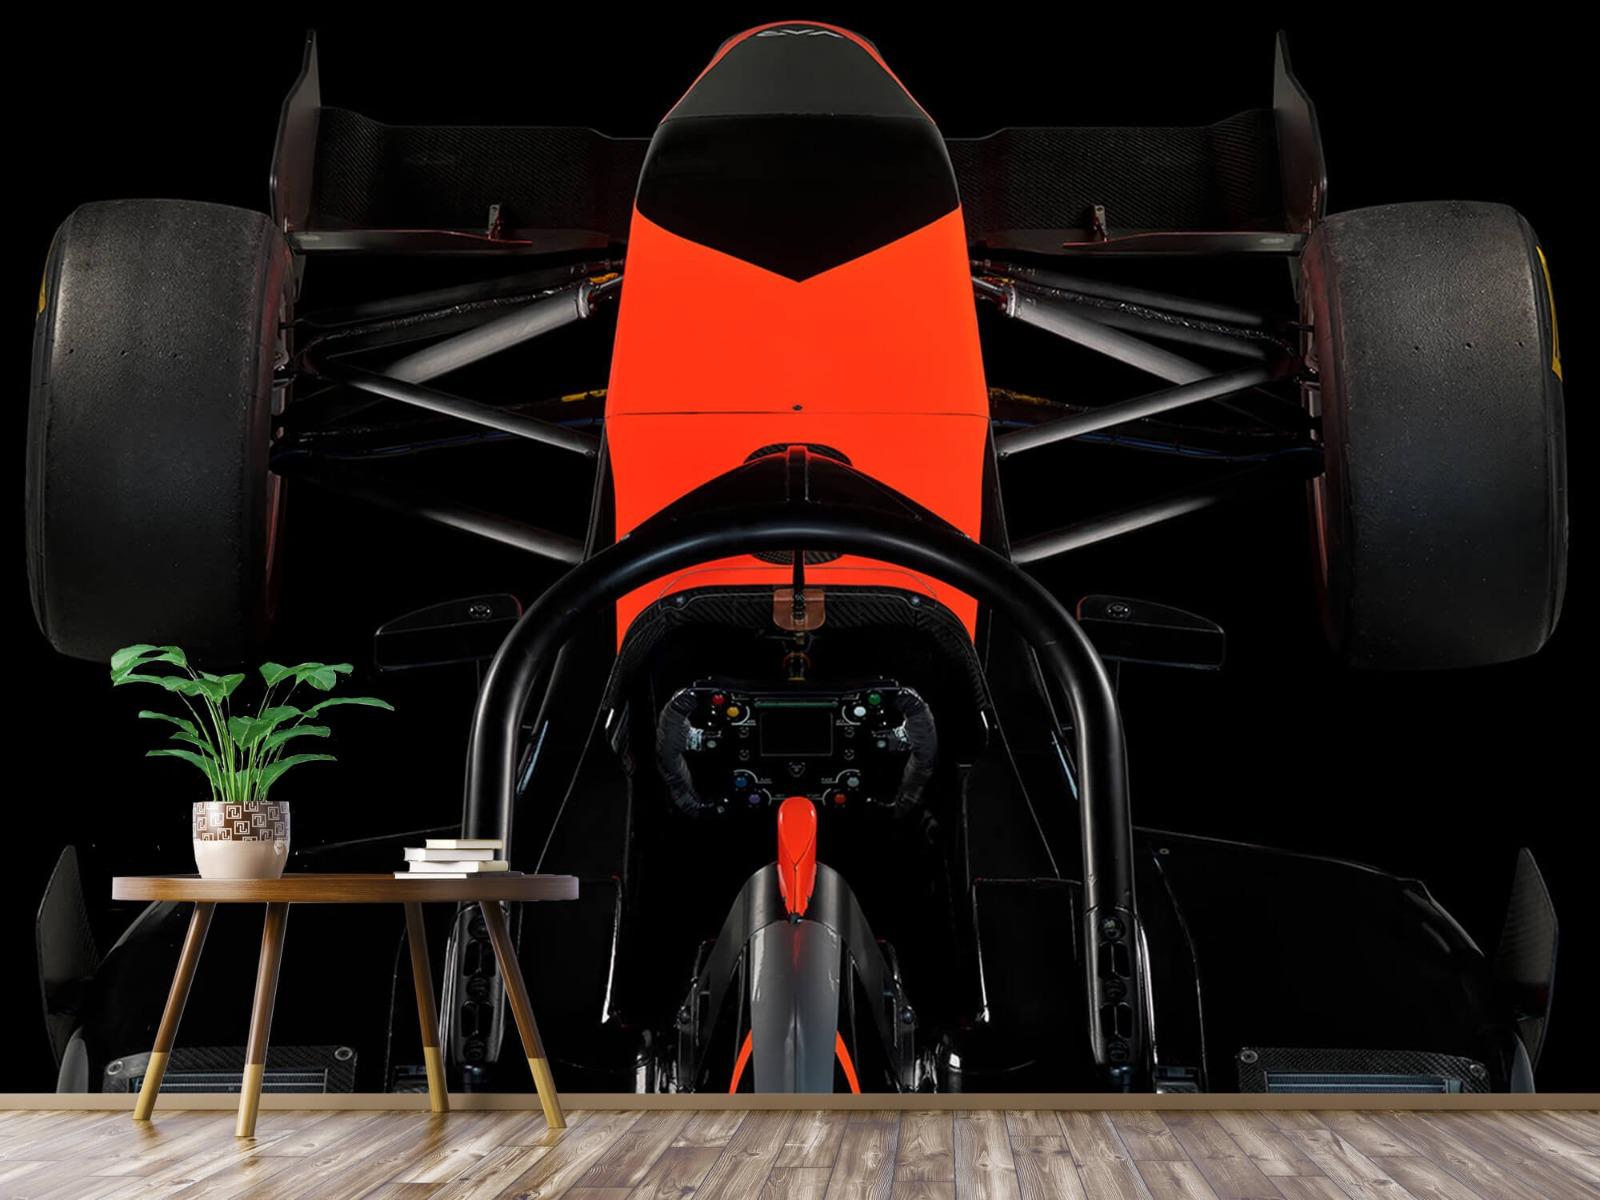 Sportauto's - Formule 3 - Cockpit view - dark - Tienerkamer 4